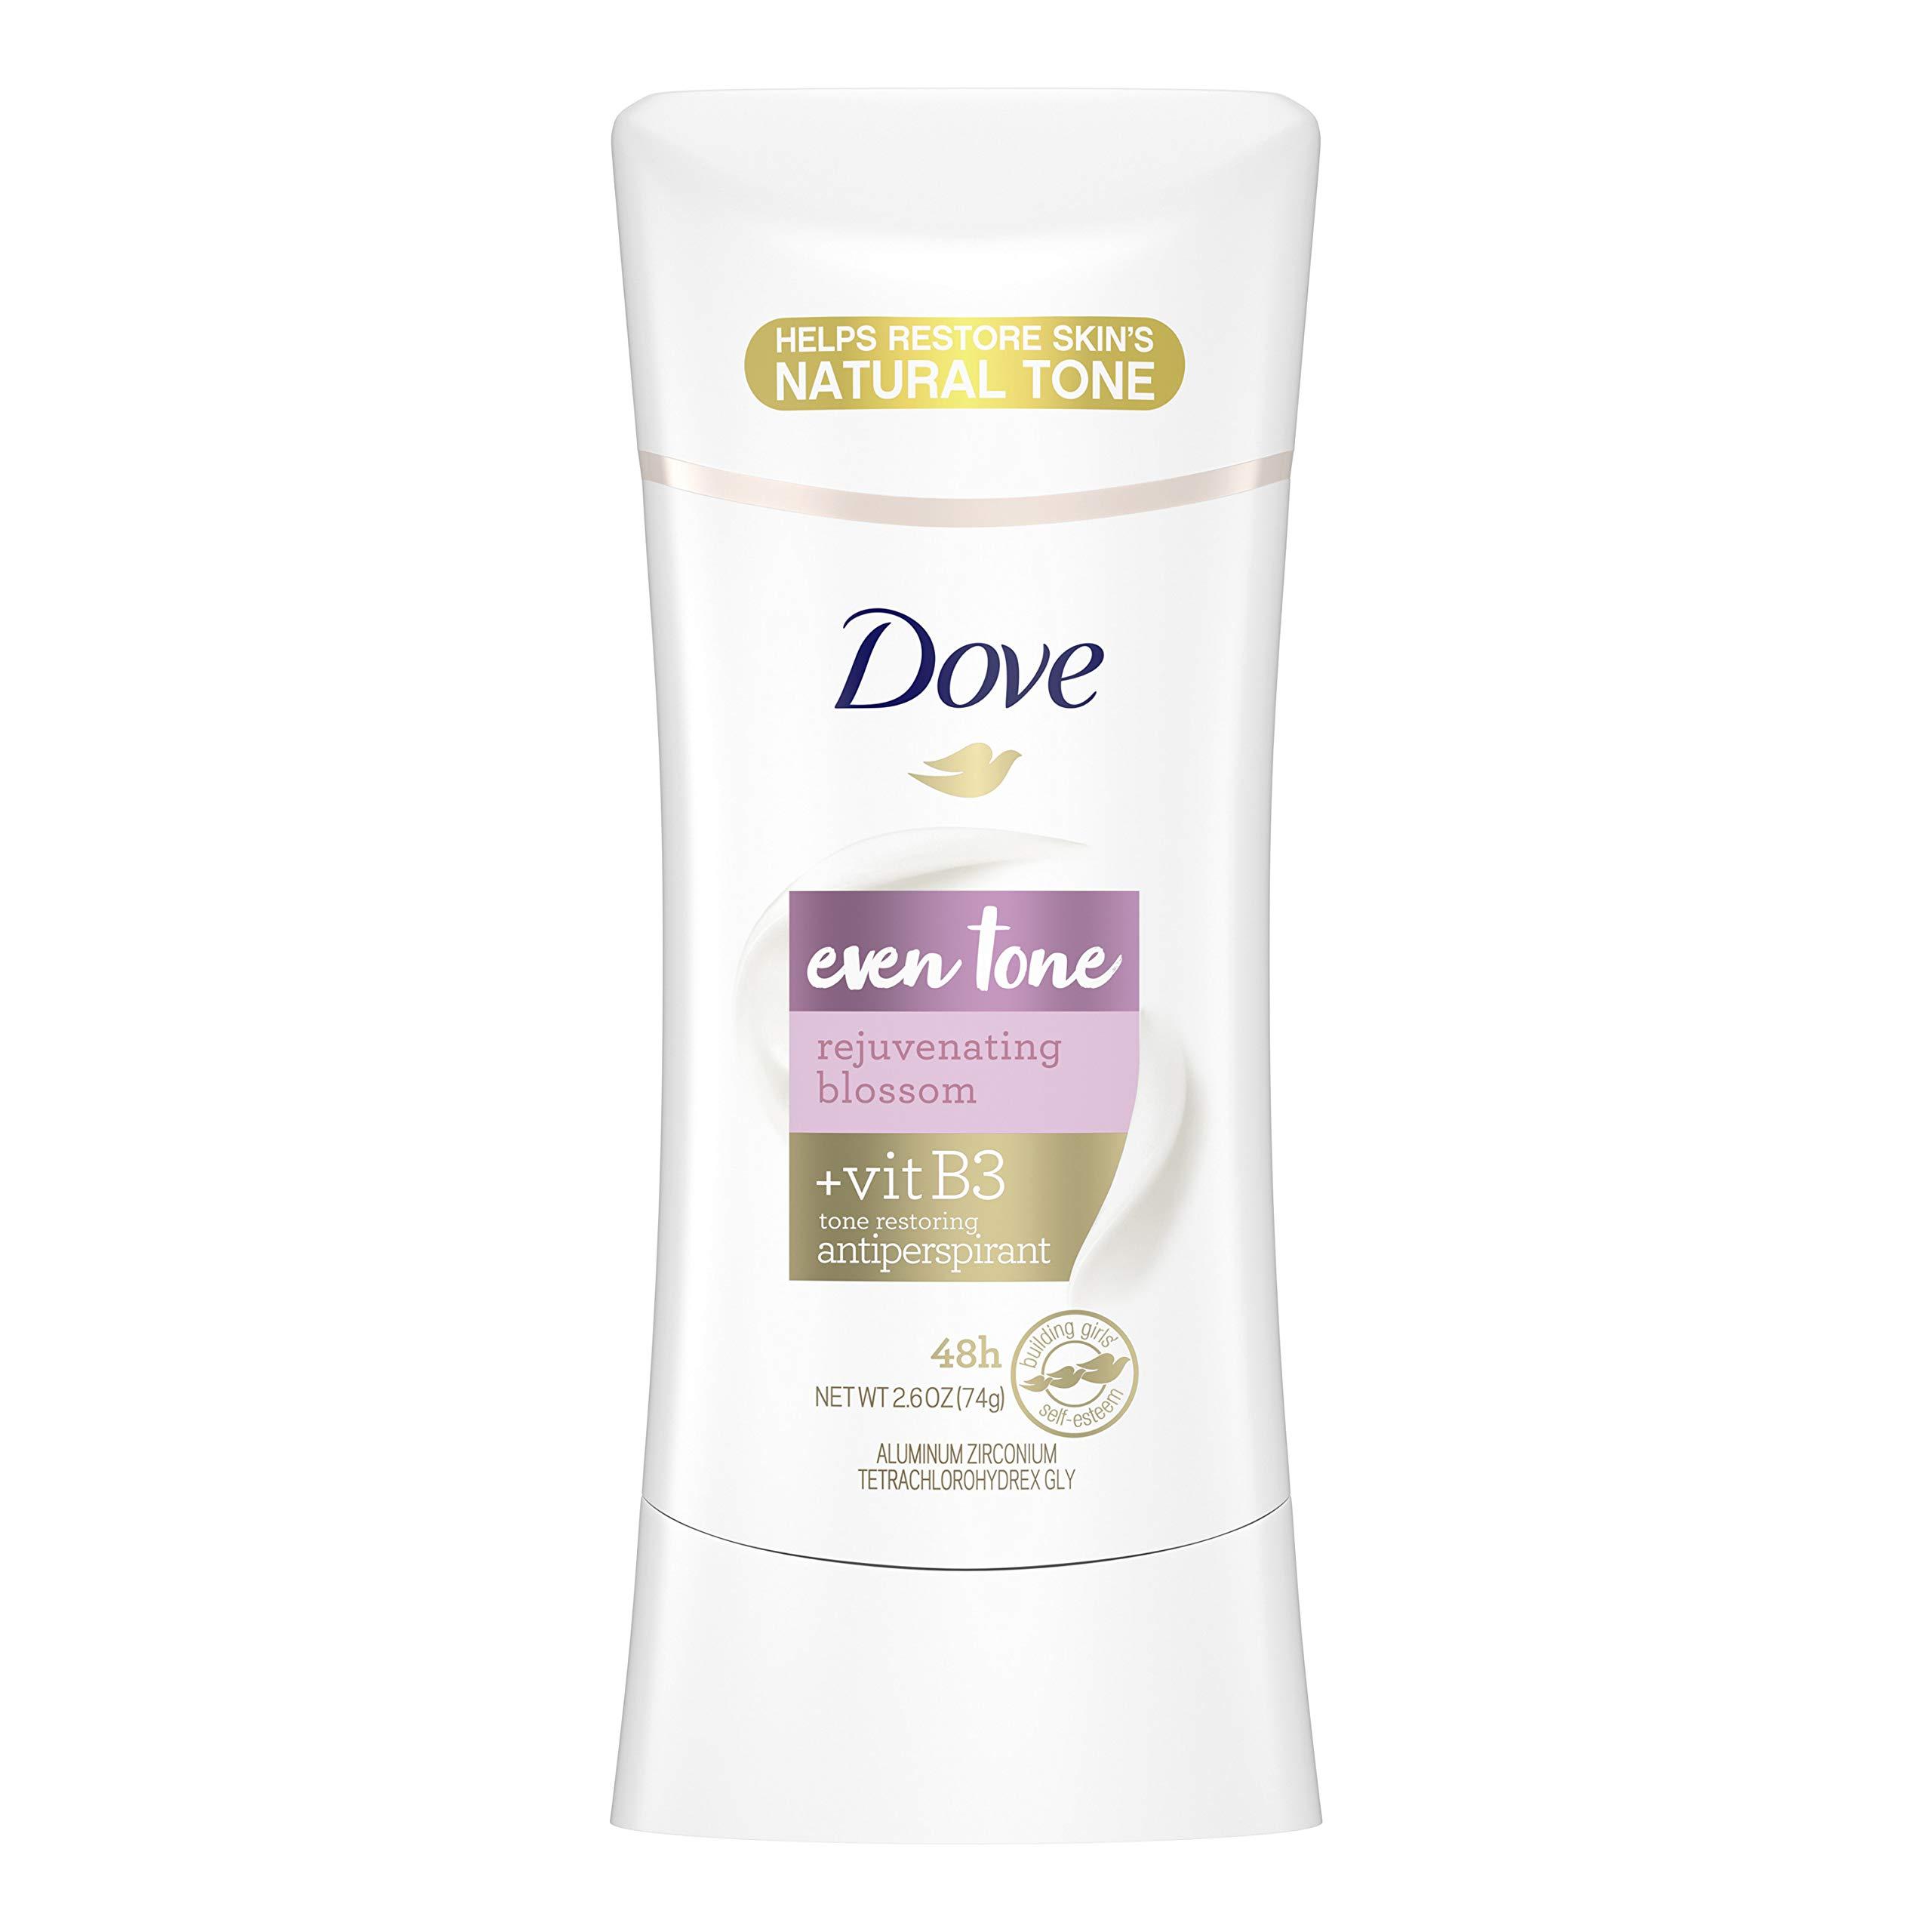 Dove Even Tone Antiperspirant For Uneven Skin Tone Rejuvenating Blossom Deodorant for Women with Dark Under Arms 2.6 oz